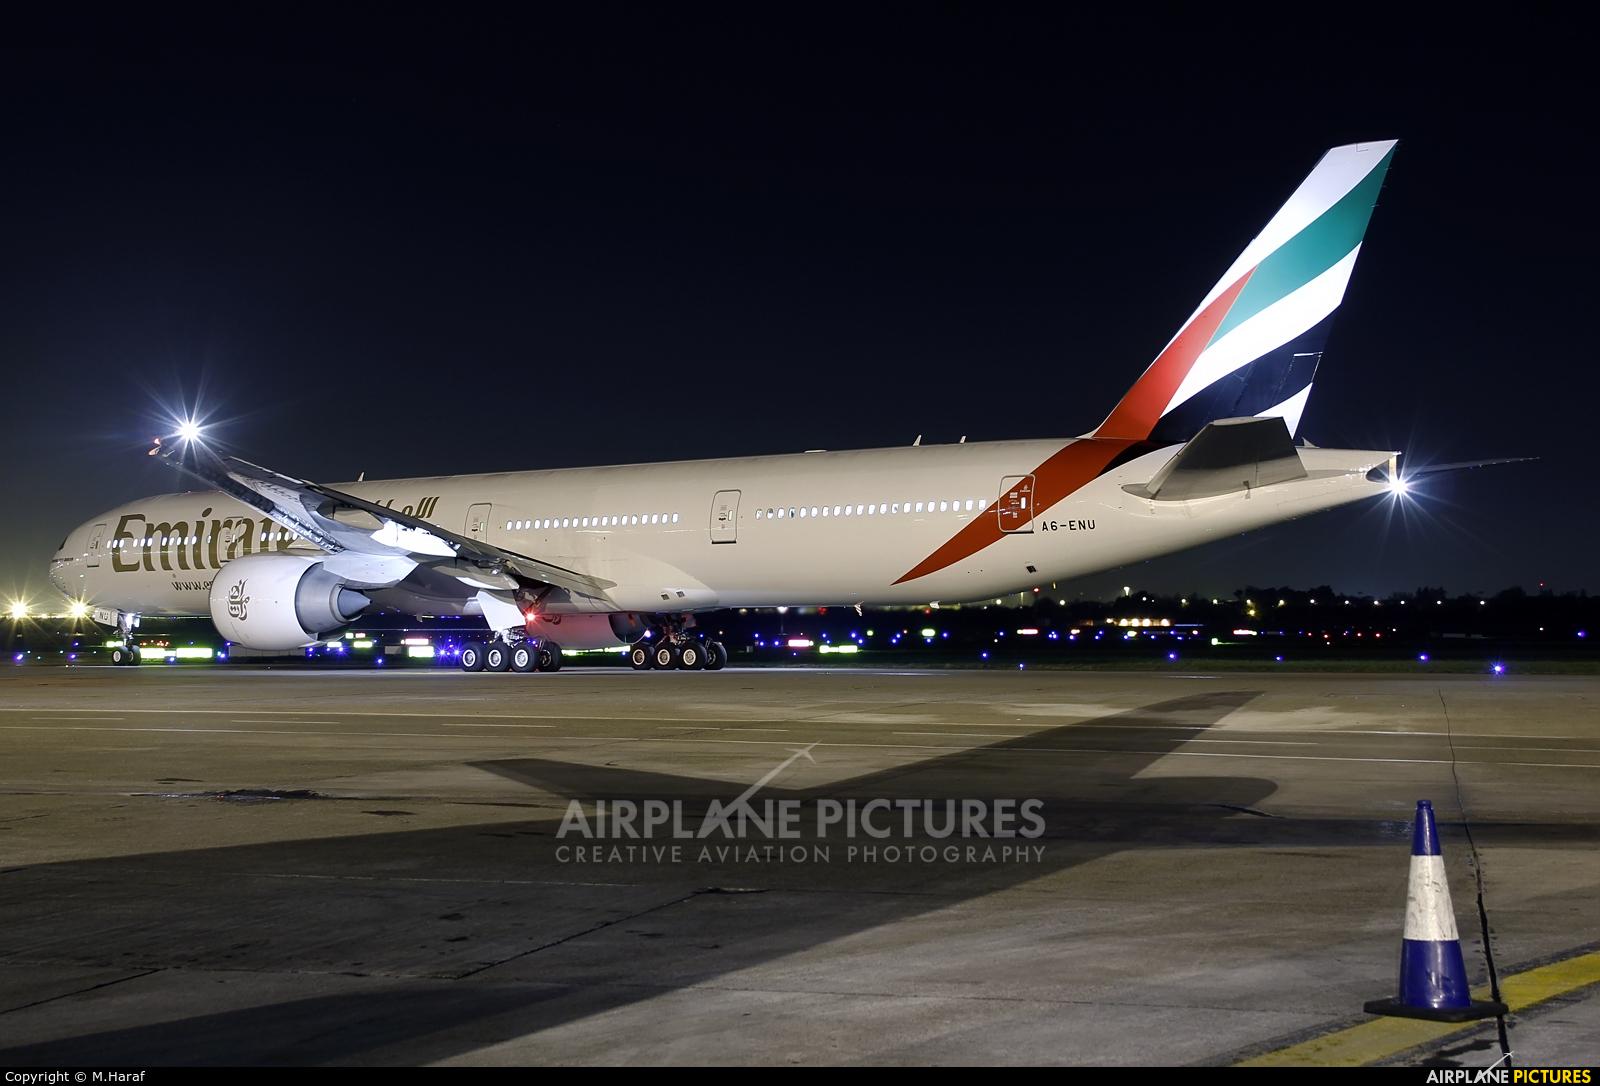 Emirates Airlines A6-ENU aircraft at Dublin